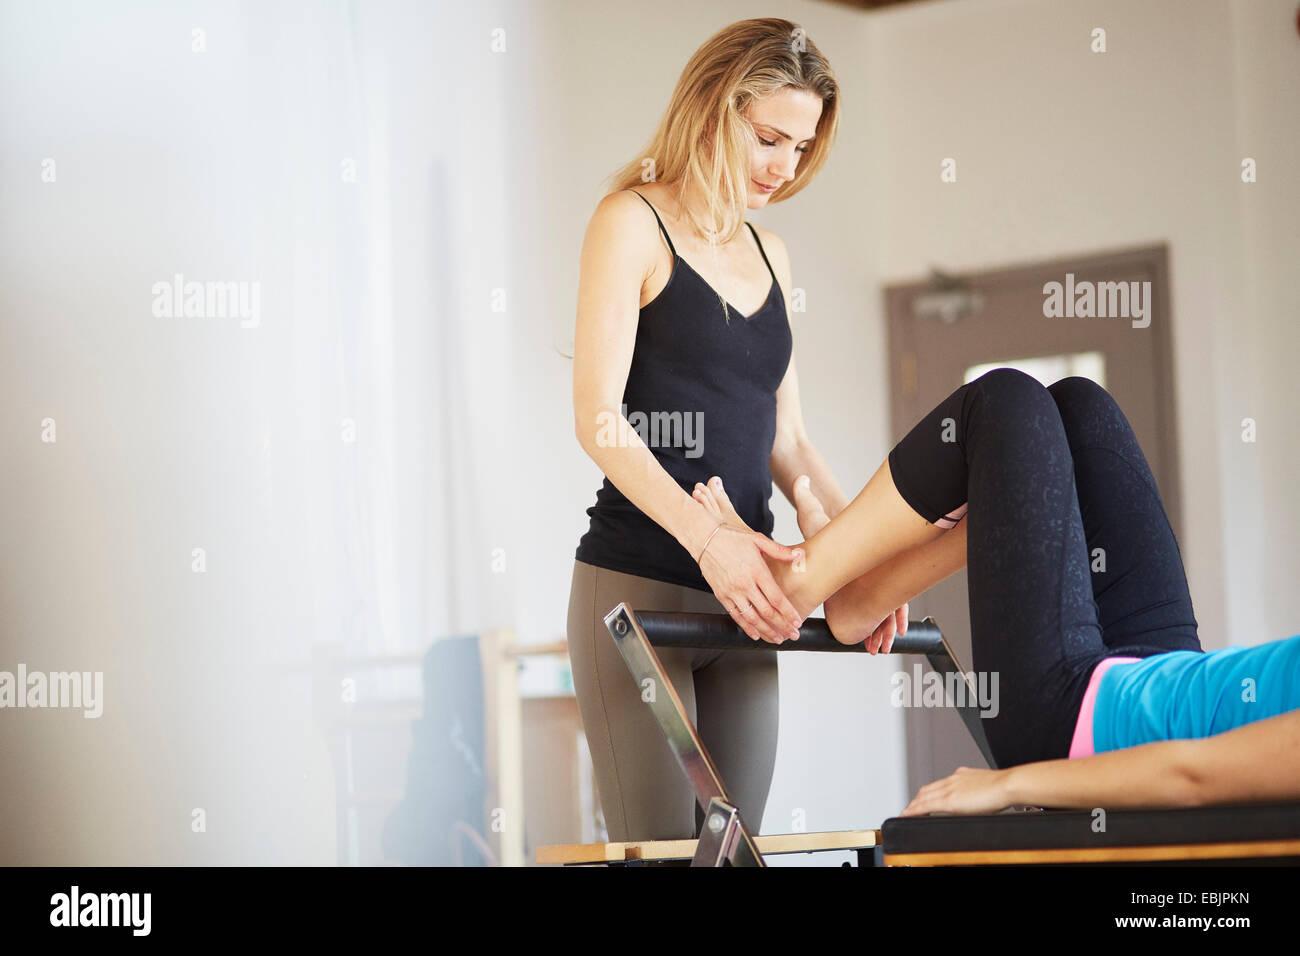 Tutor holding feet of female student lying on reformer in pilates gym - Stock Image